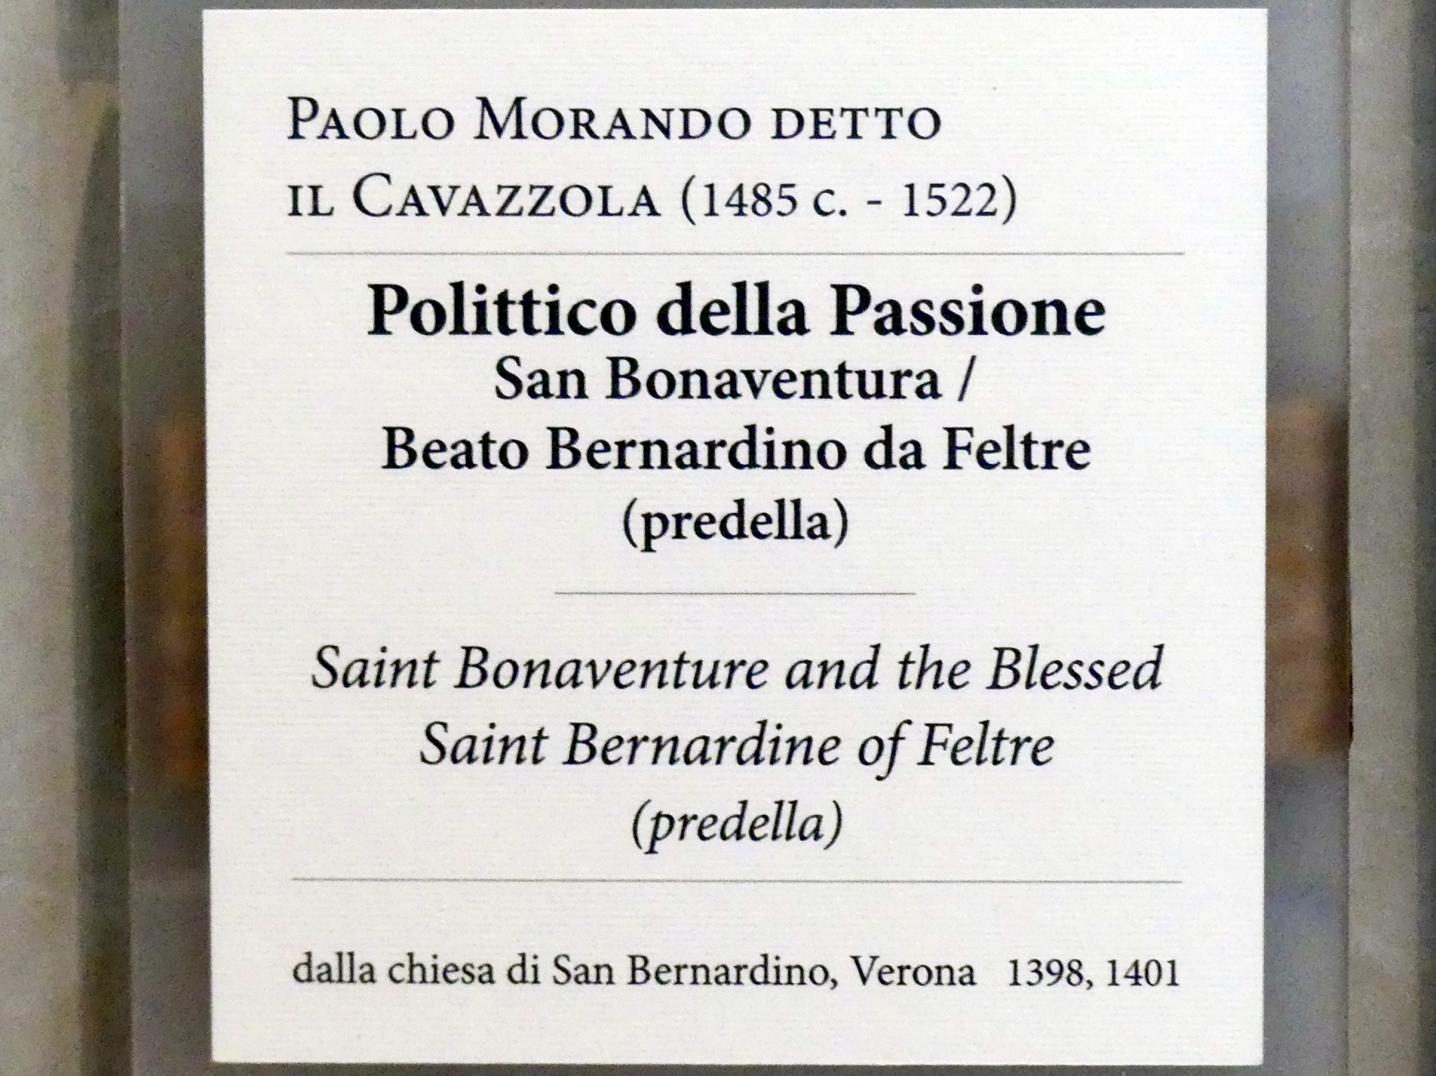 Paolo Morando (Cavazzola): Predella des Polyptichons der Passion, 1517, Bild 7/7